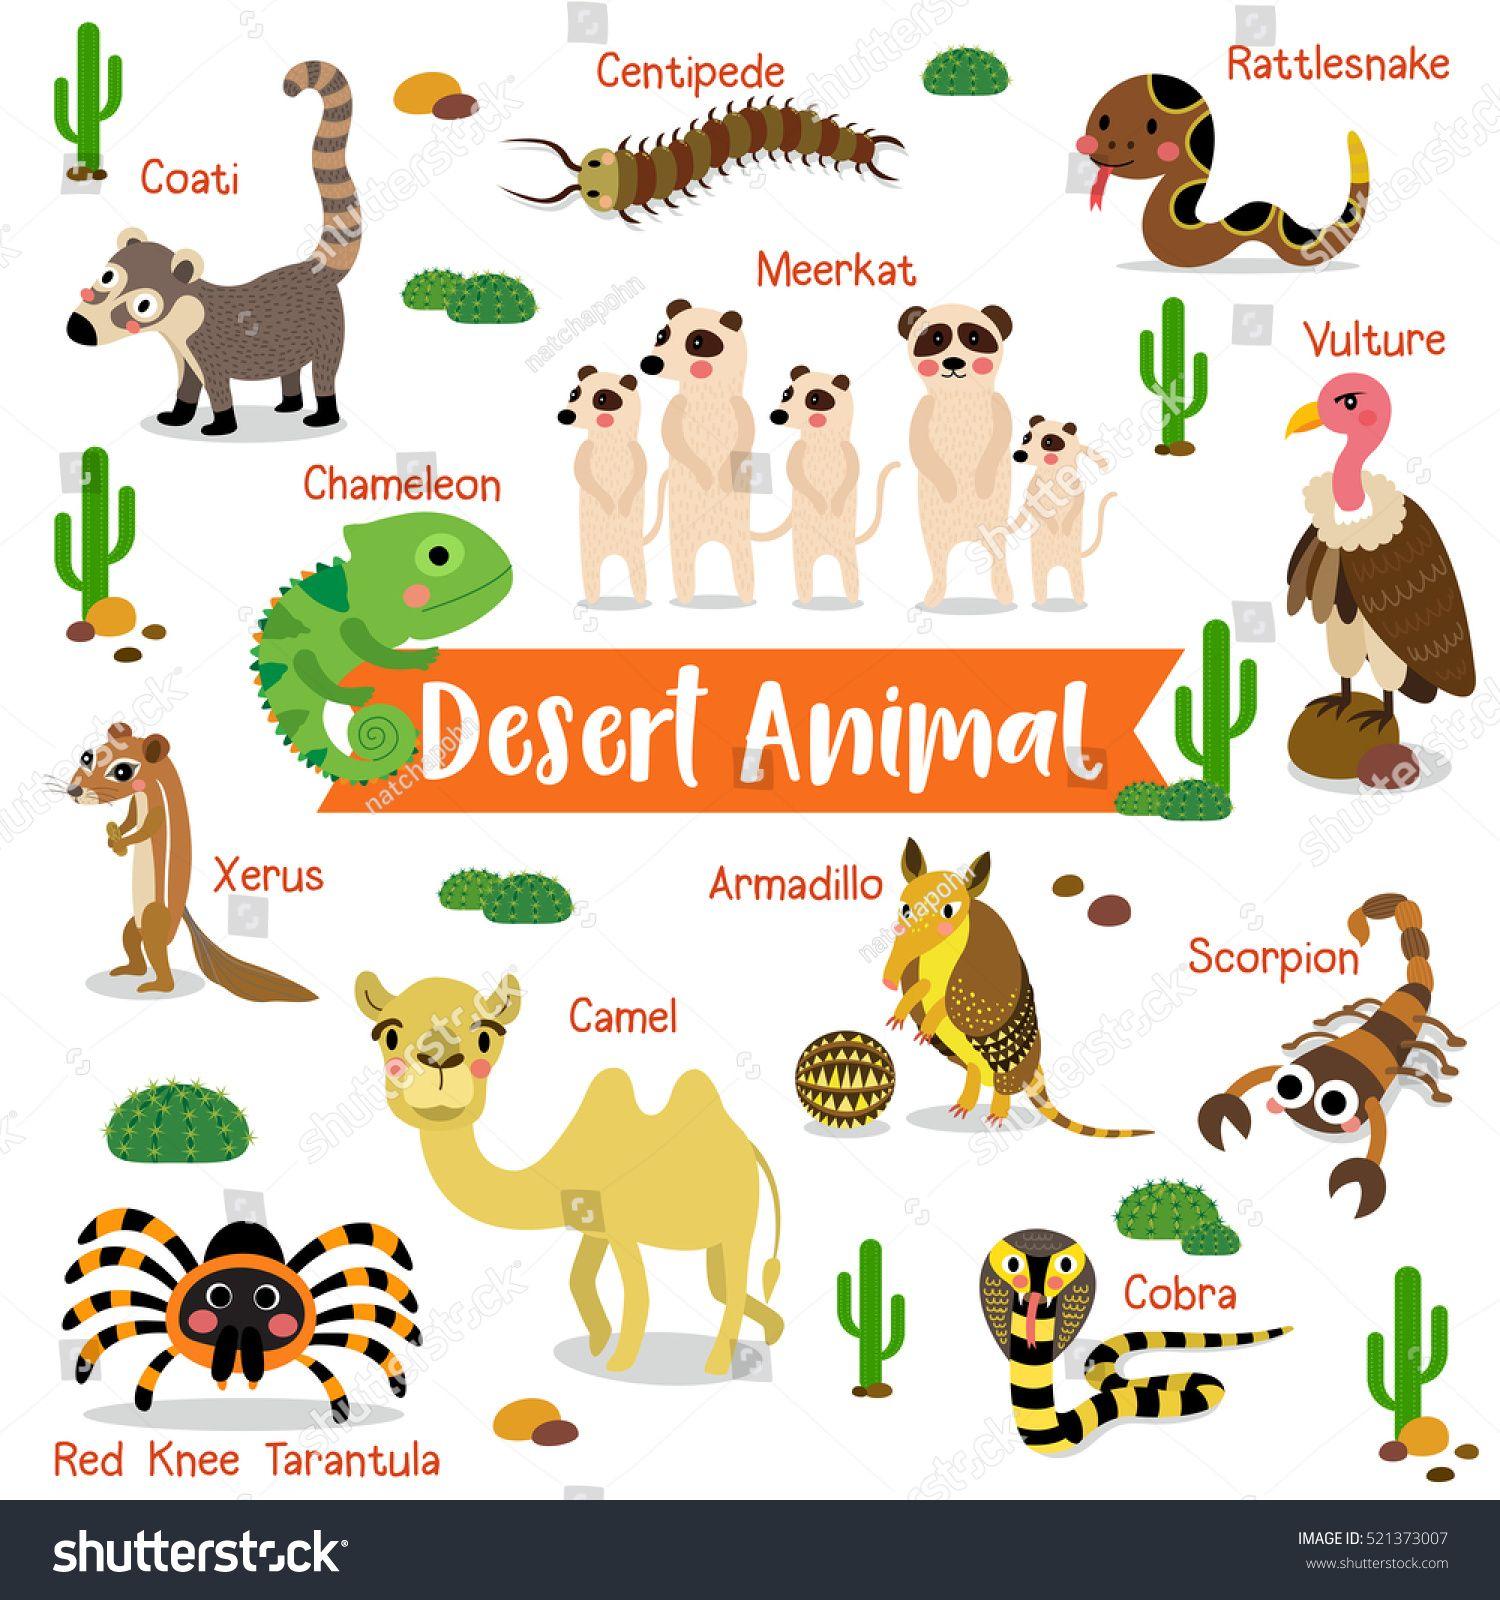 Desert Creature Cartoon On White Background With Animal